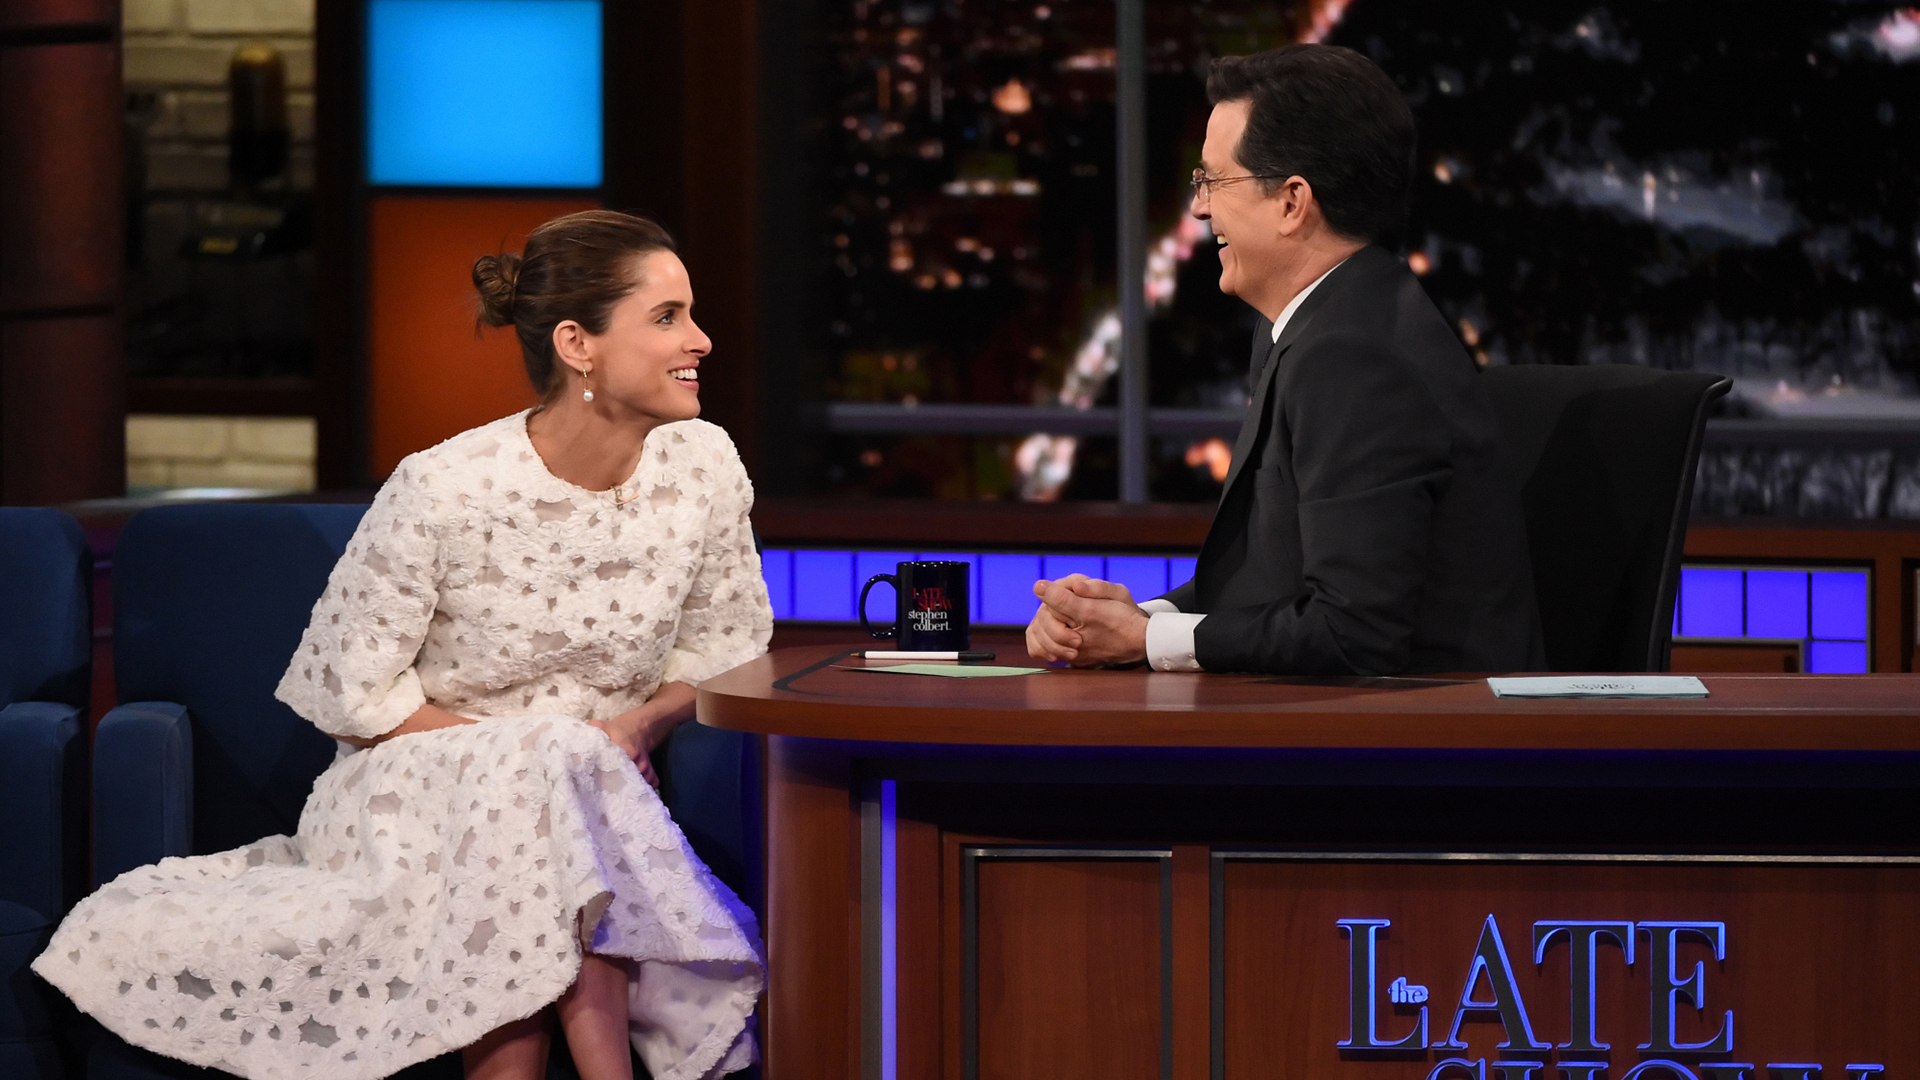 Amanda Peet and Stephen Colbert